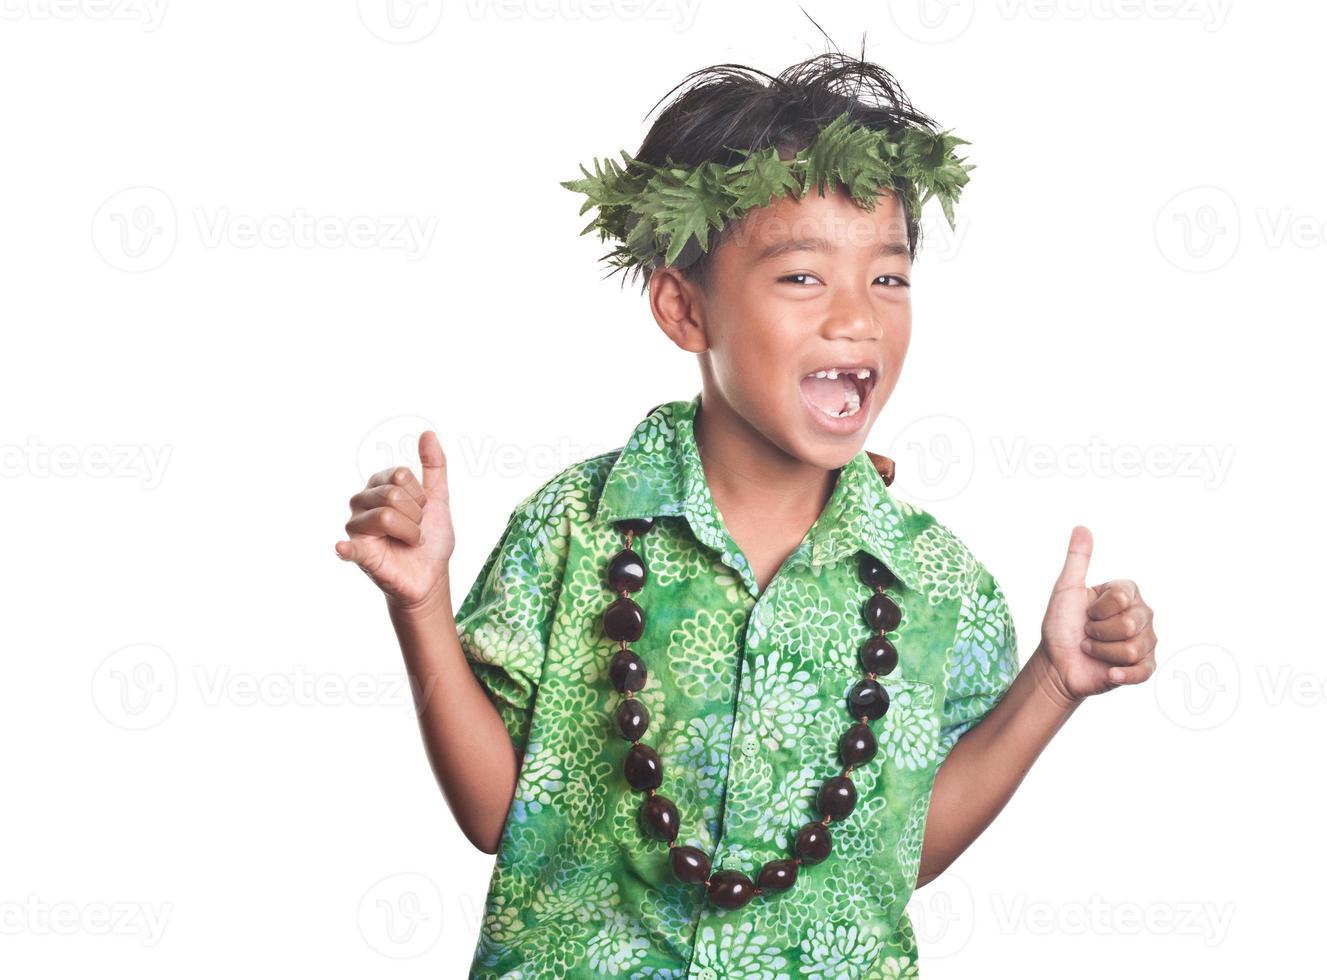 giovane maschio diffondendo aloha allegria foto